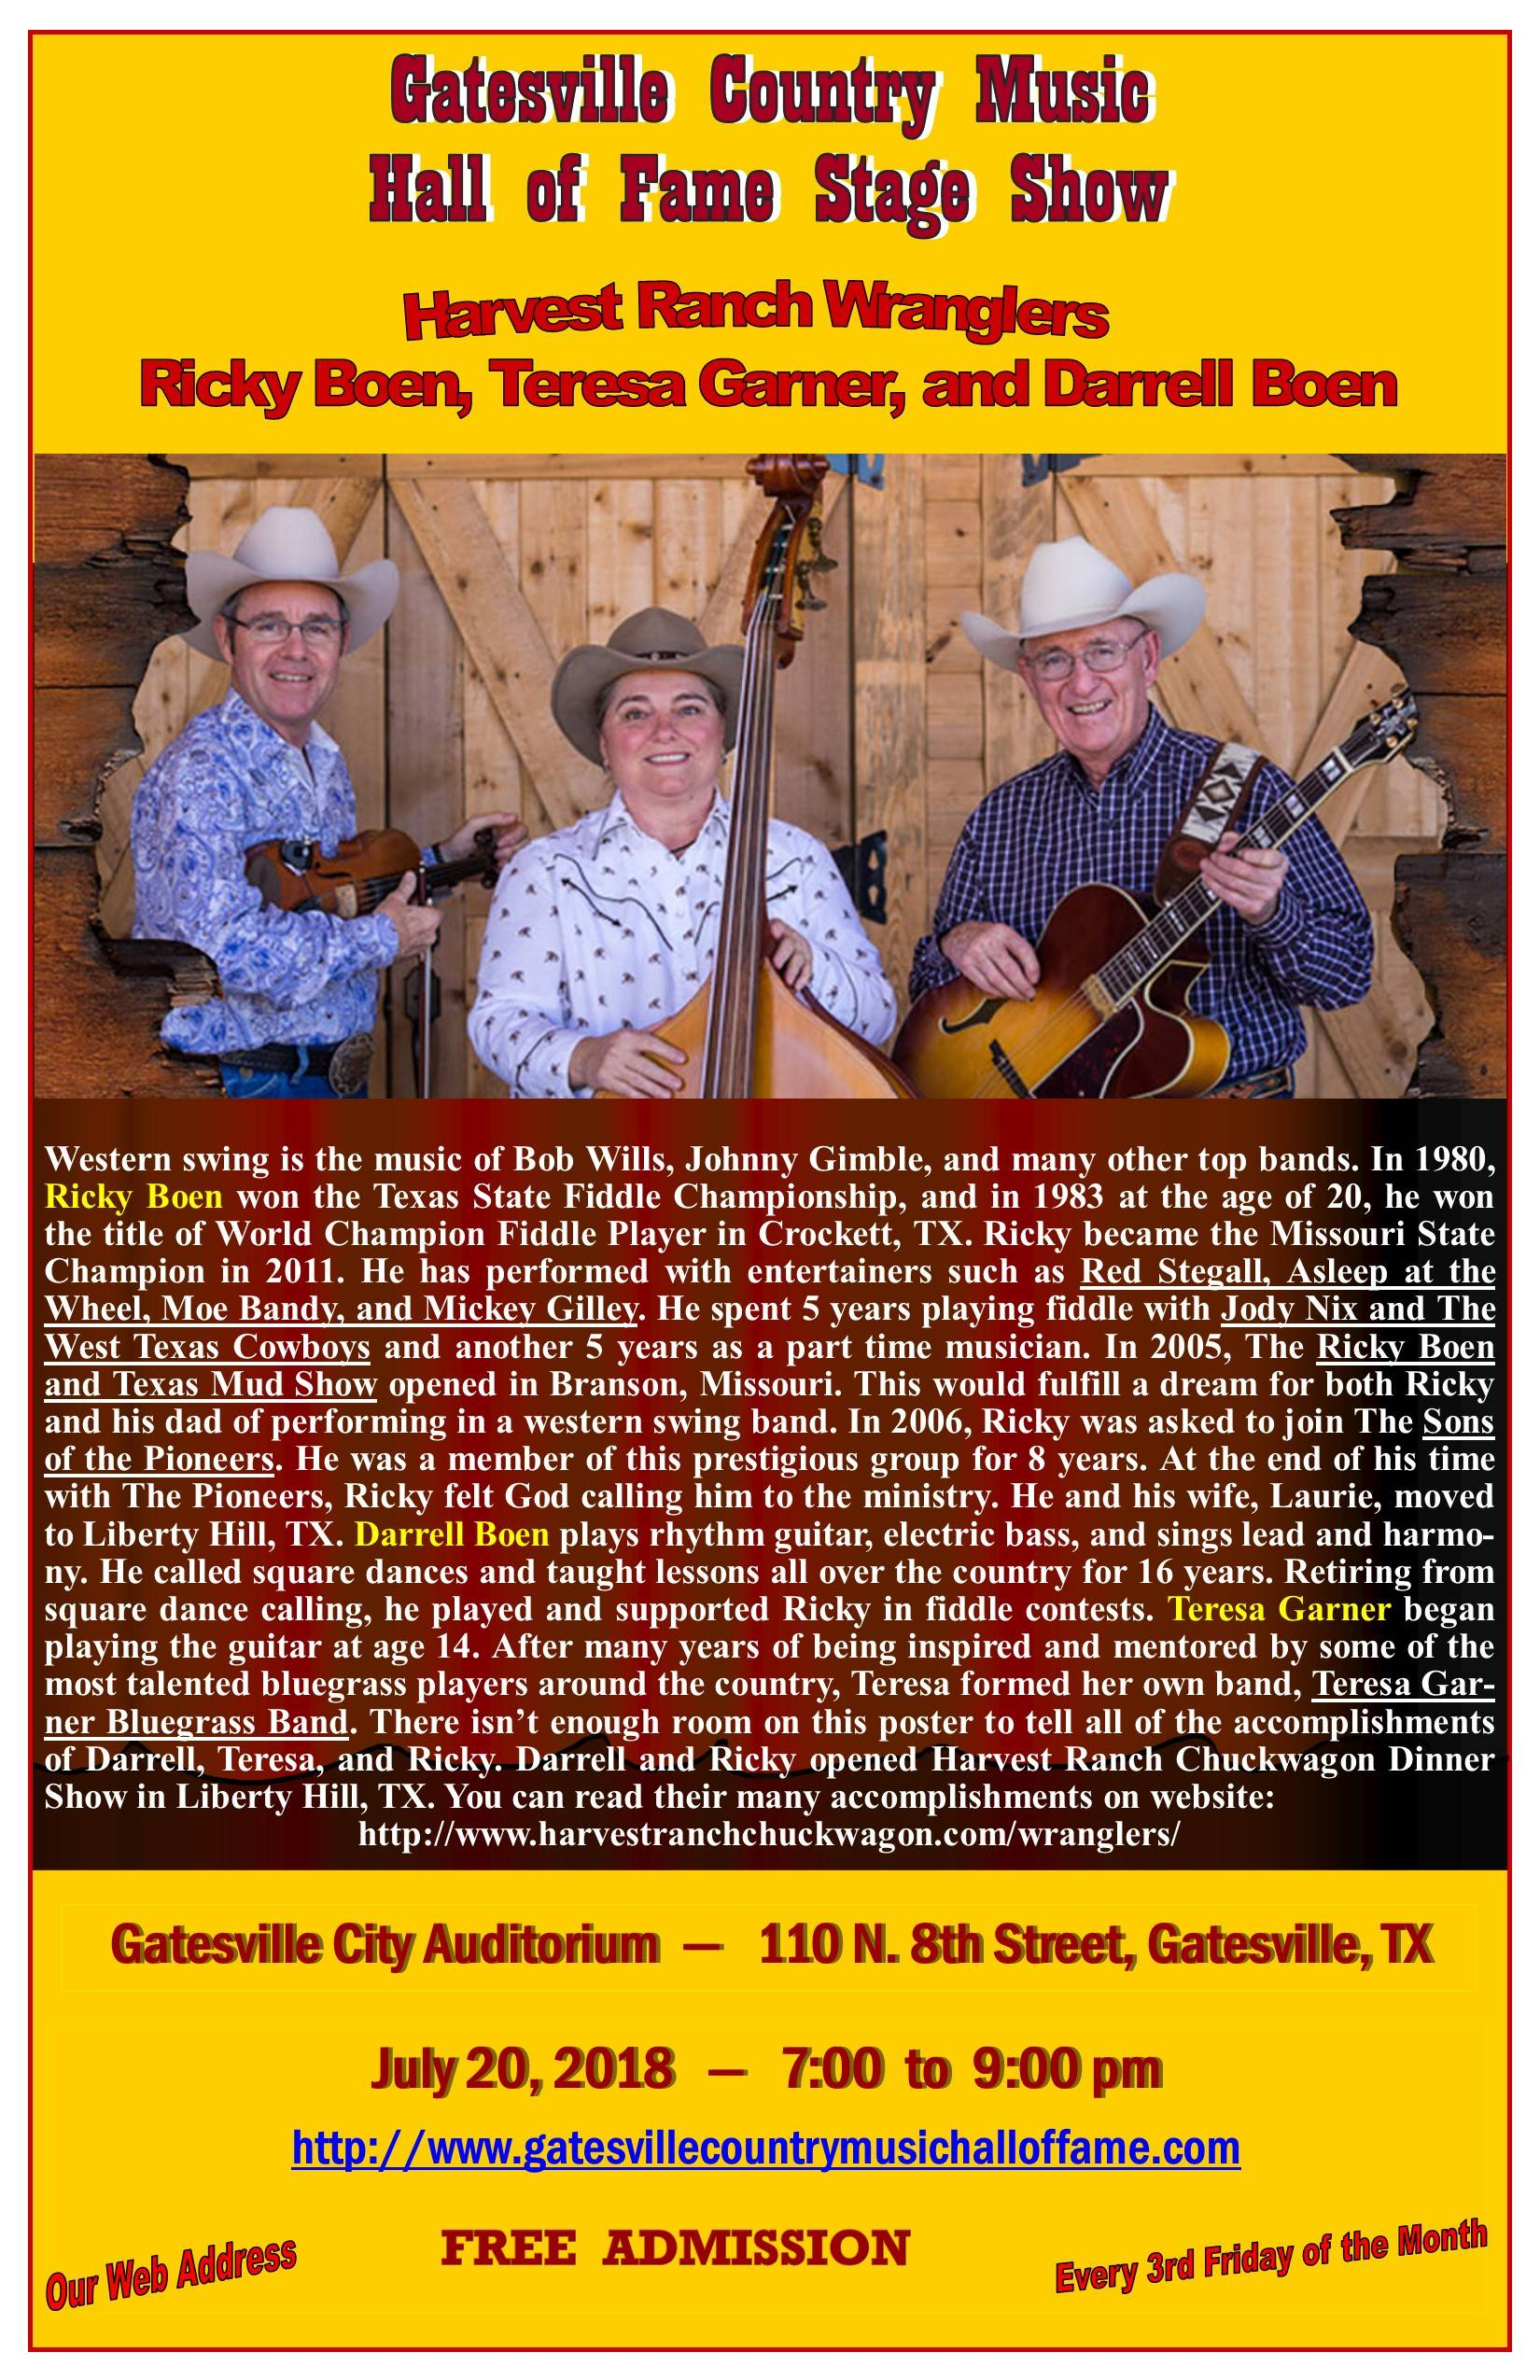 Harvest Ranch Wranglers, July 20, 2018